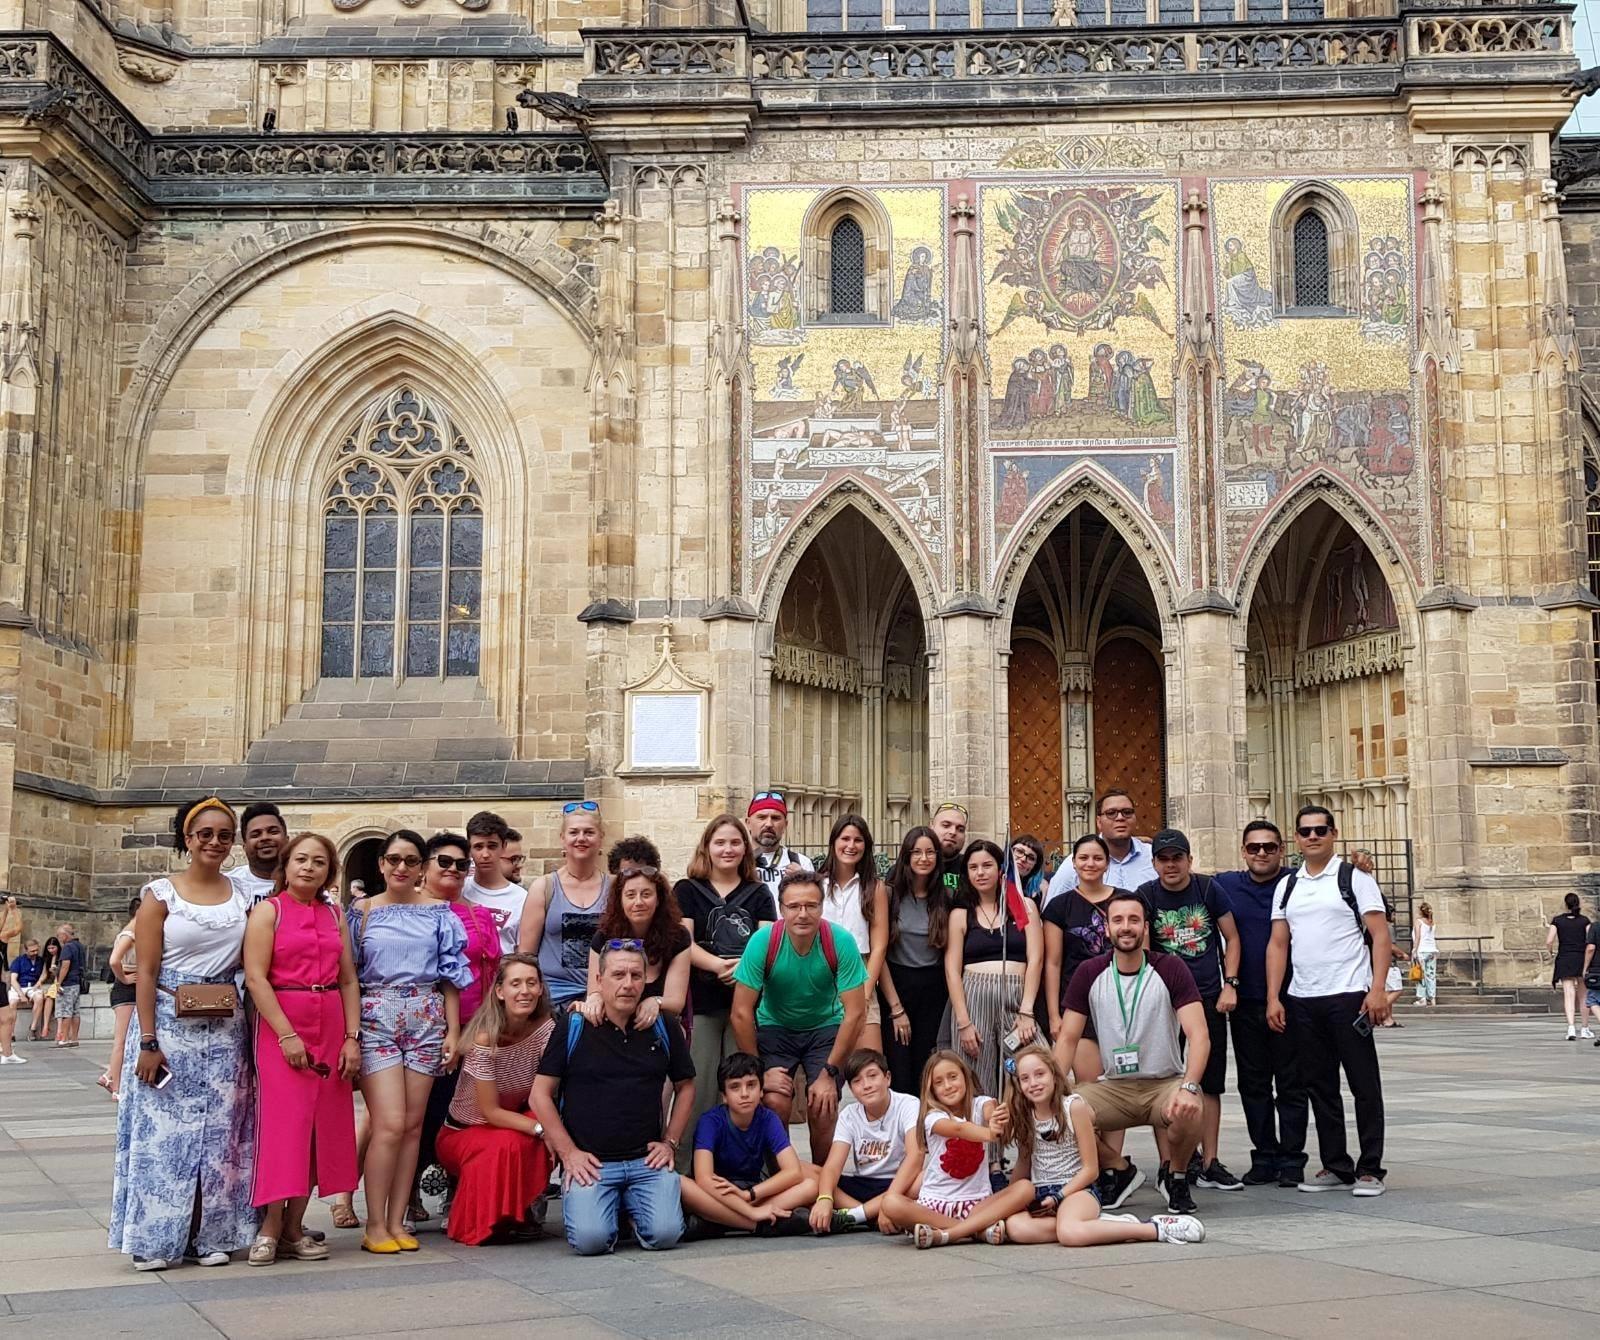 prague-castle-and-mala-strana-district-tour-14